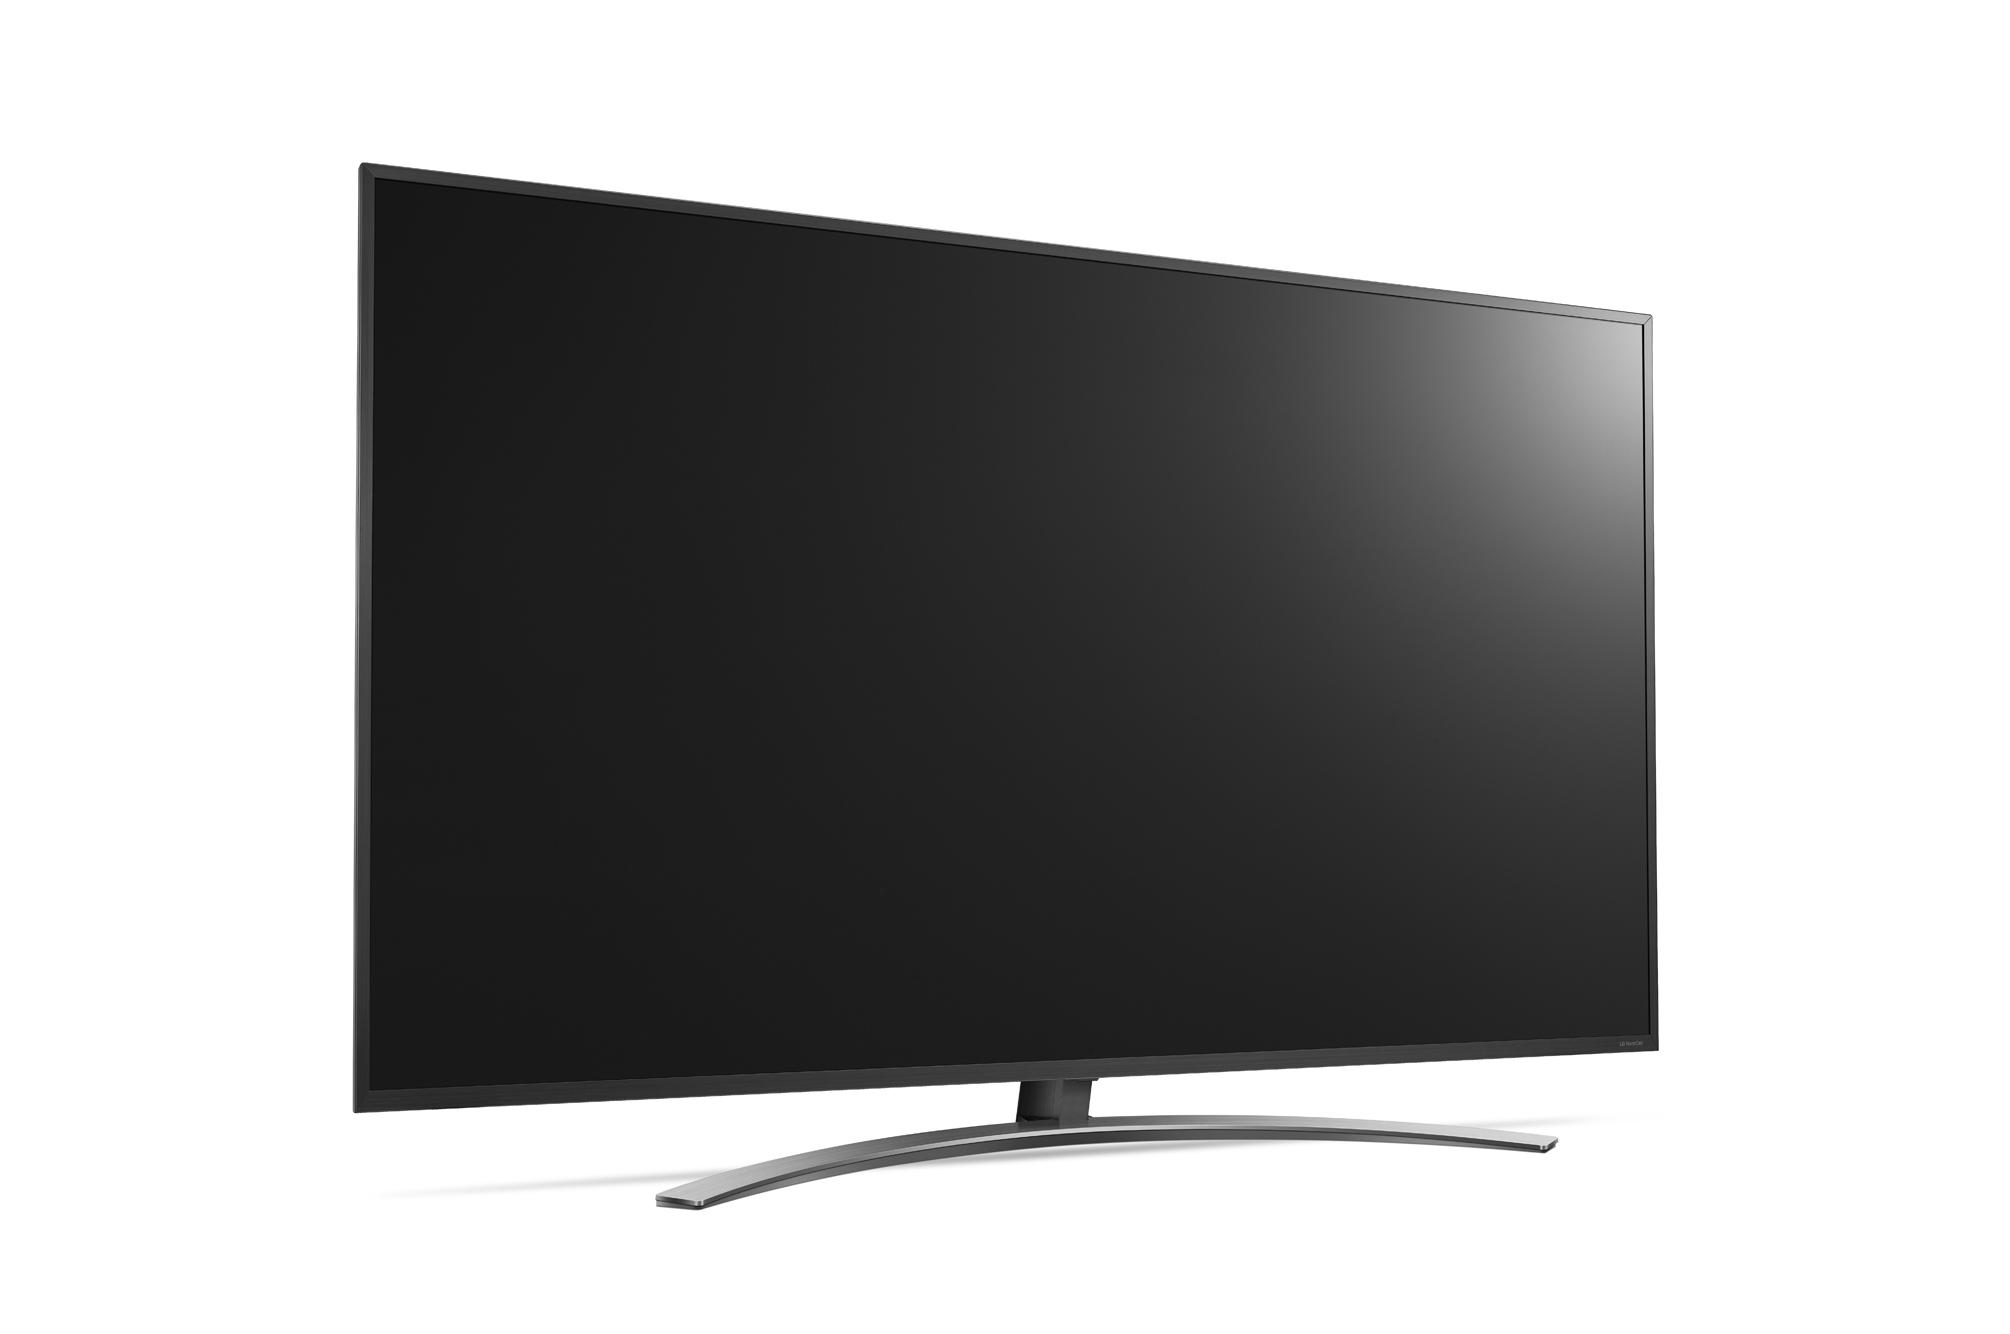 LG Pro:Centric SMART 75UT770H (NA) 7